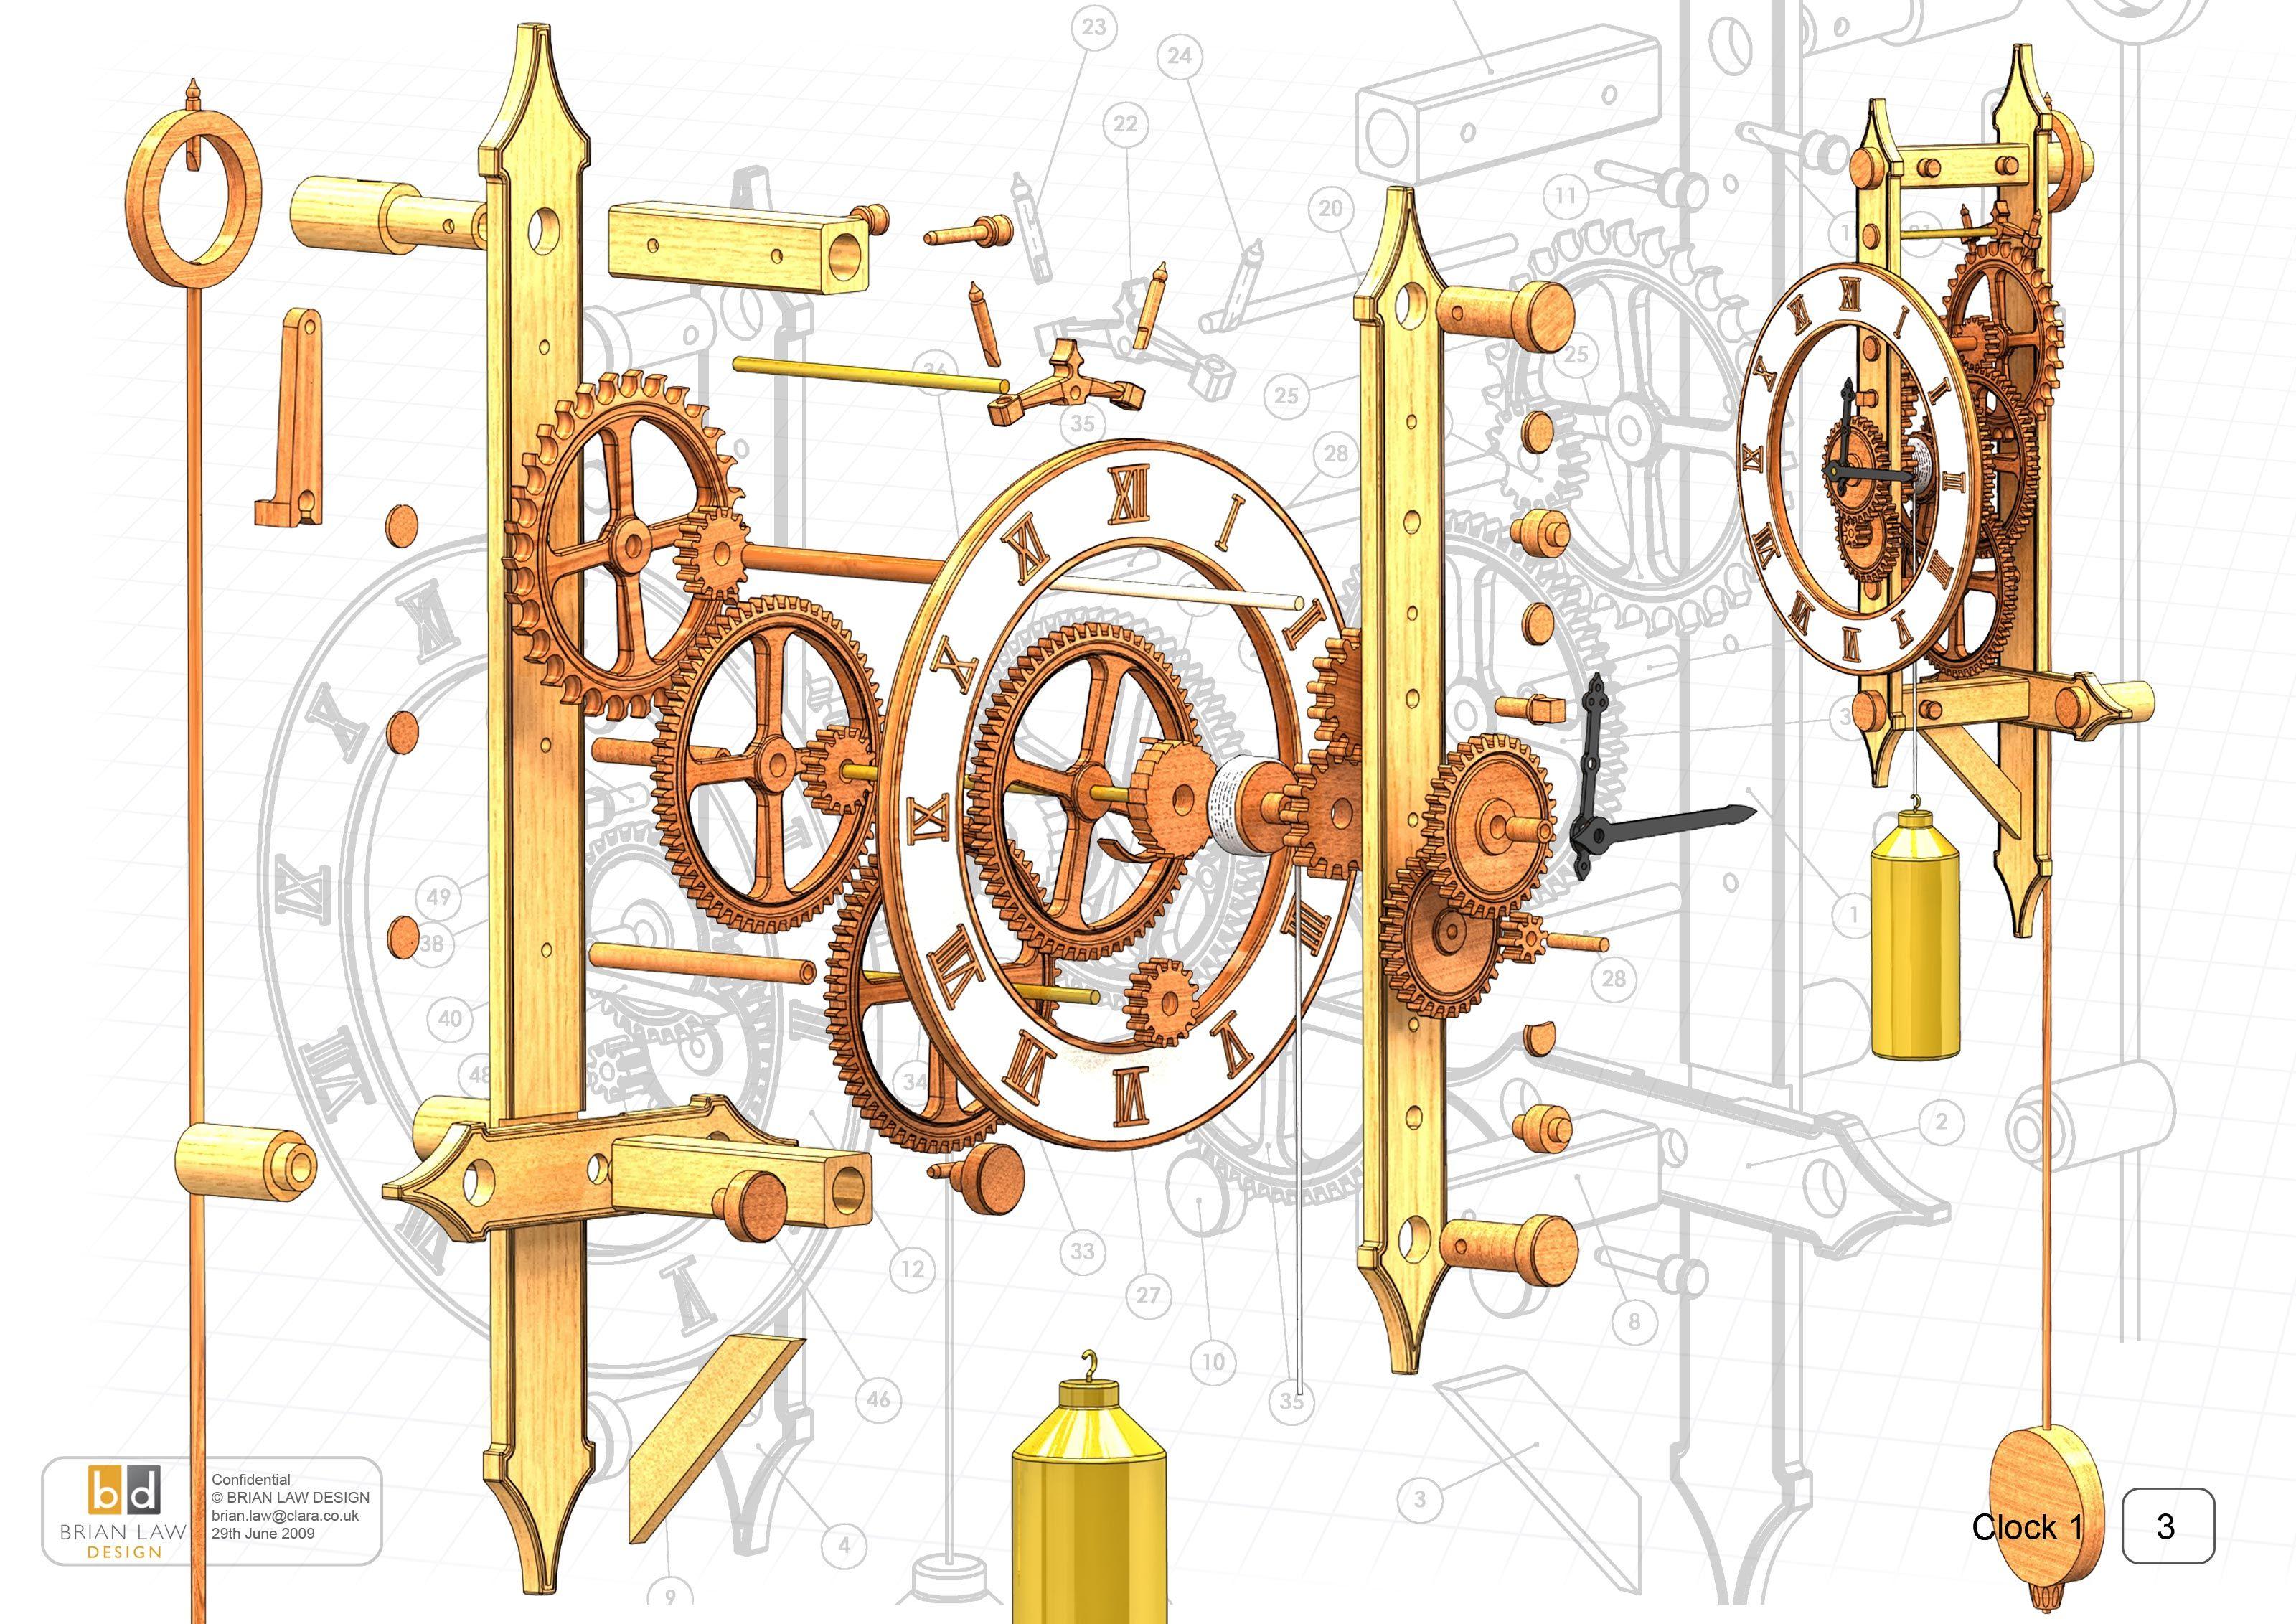 wooden clock | Wooden Gear Clock Plans Free Dxf